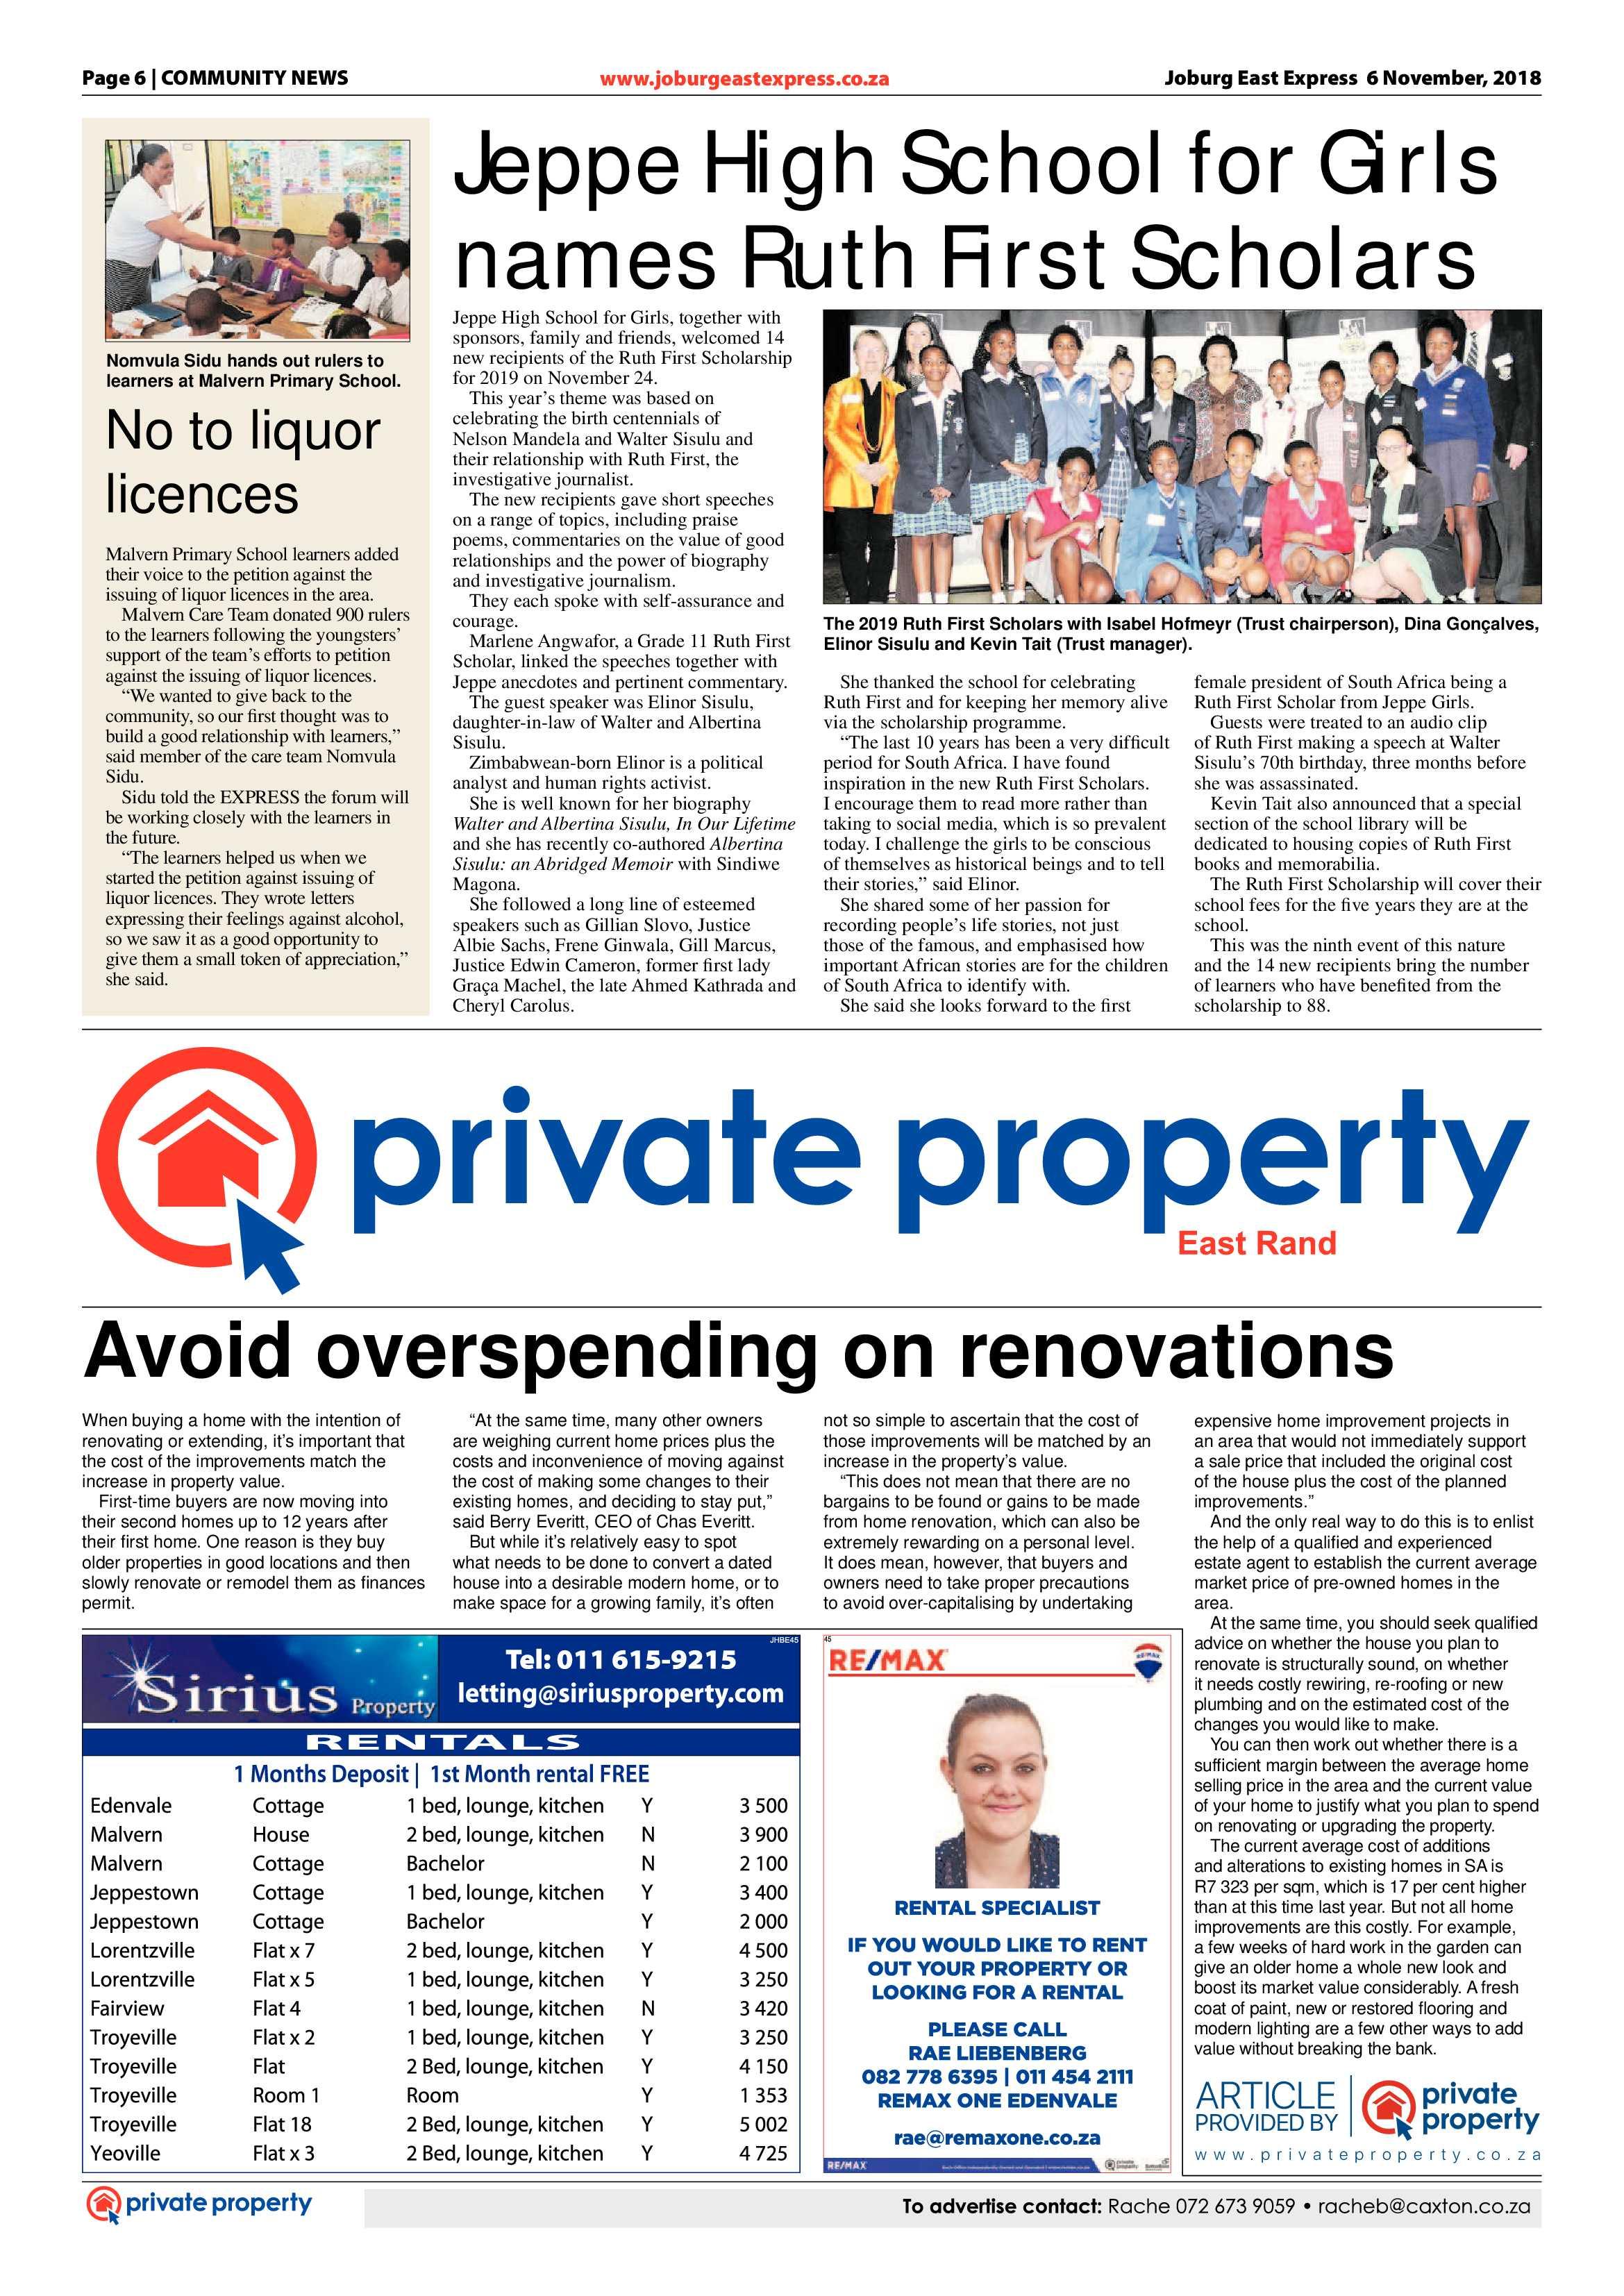 joburg-east-express-06-november-2018-epapers-page-6